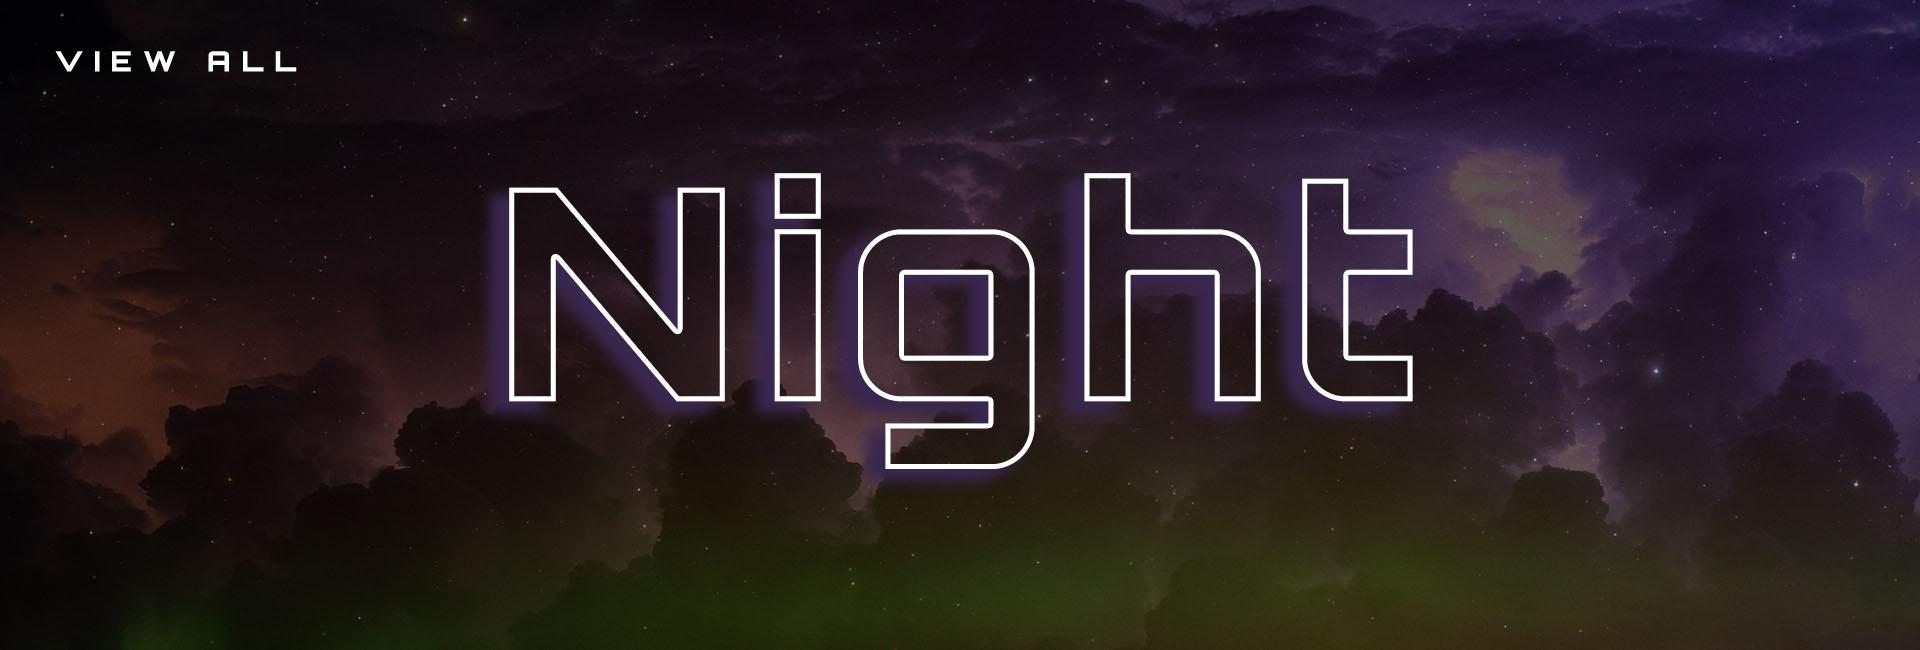 Watch all 4K Night clips